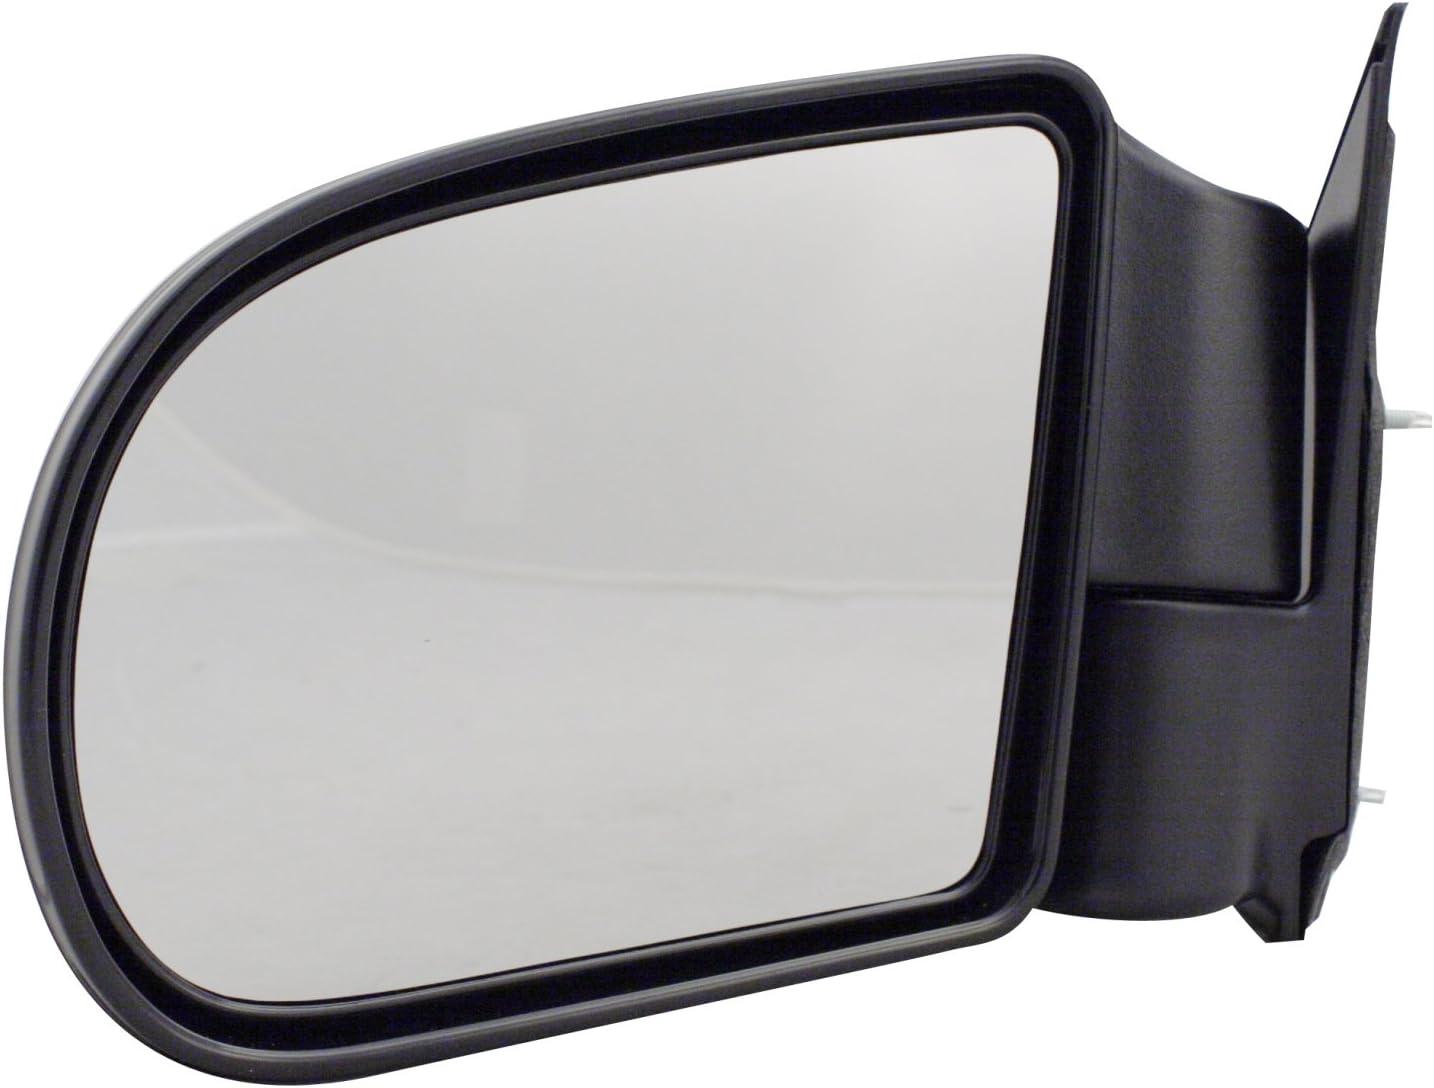 Popular brand Pilot CV9609410-7L00 Chevrolet Blazer Black Replacement Recommendation Manual D